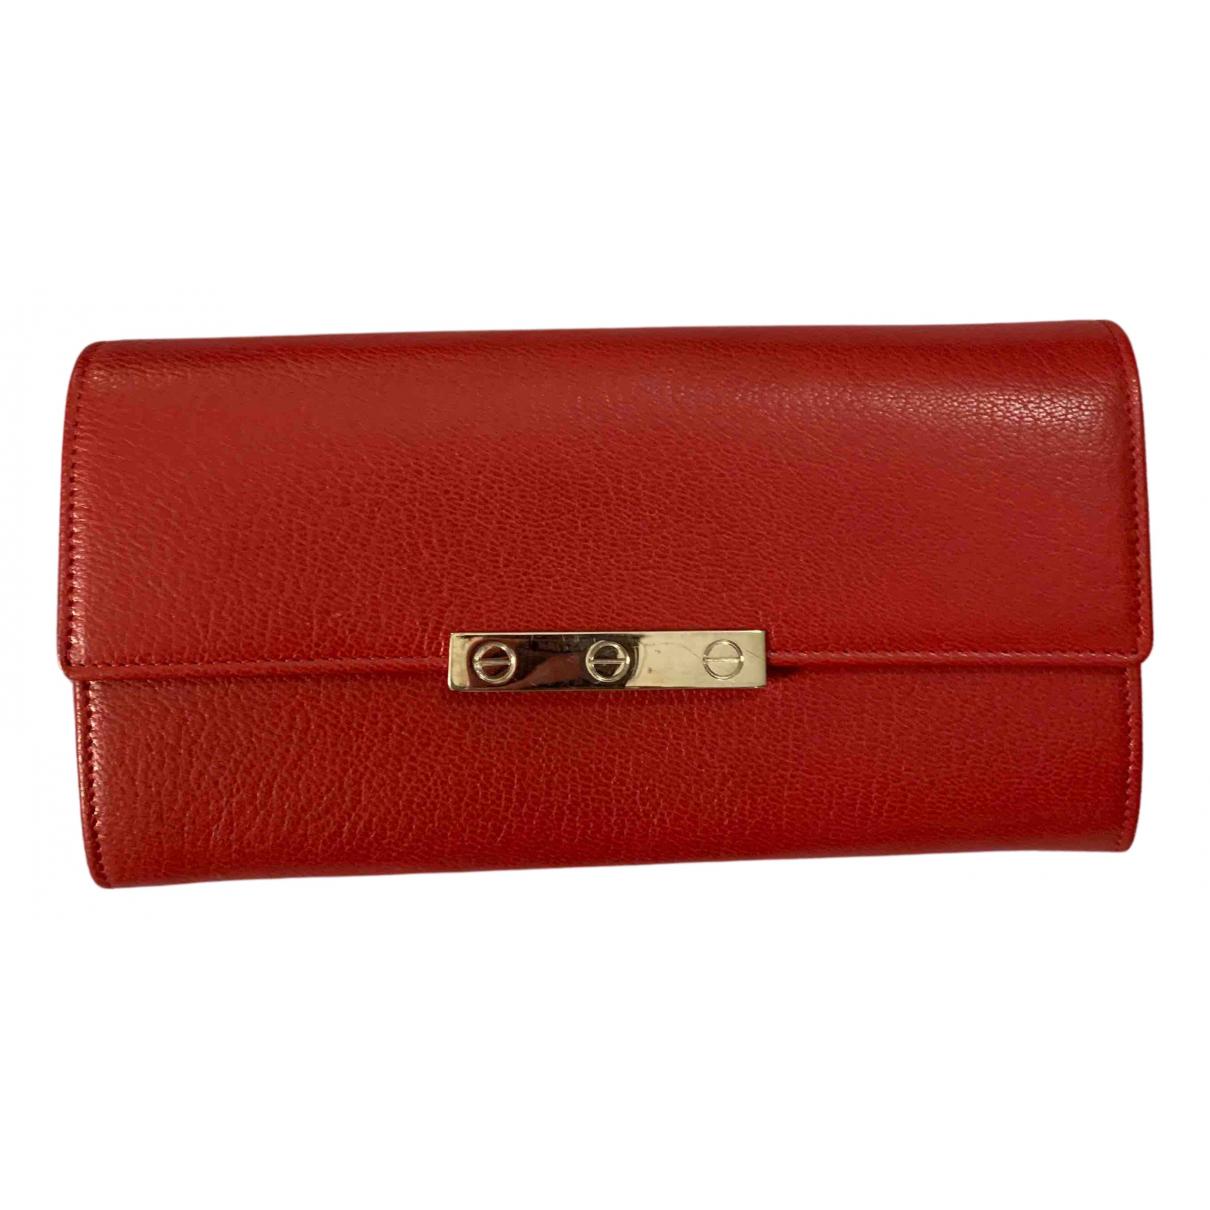 Cartier N Leather wallet for Women N